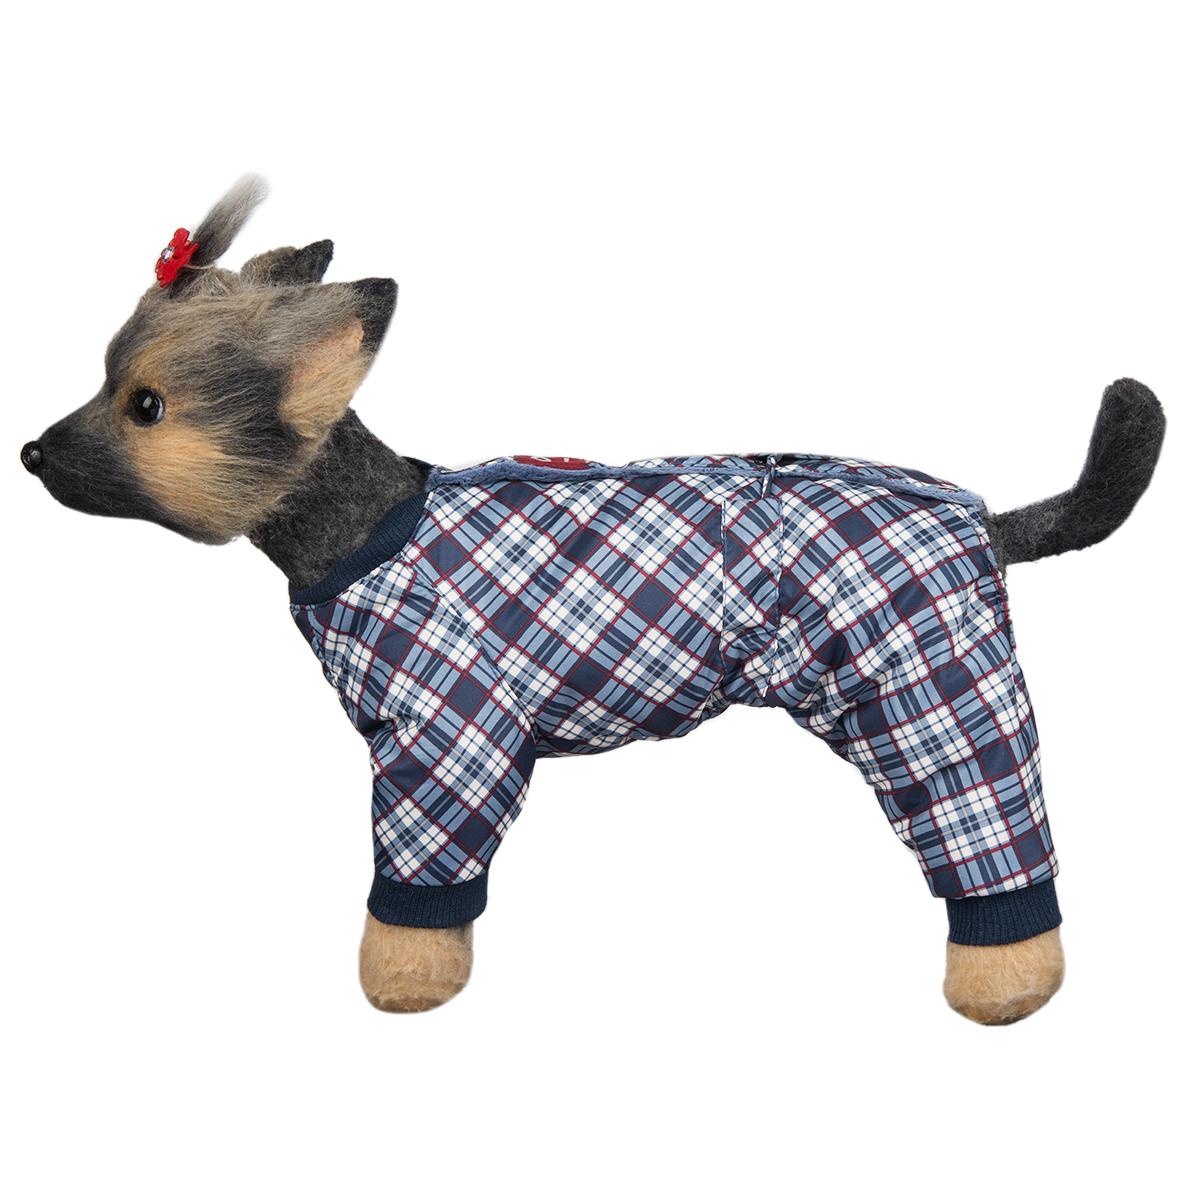 "Комбинезон для собак Dogmoda ""Нью-Йорк"", зимний, для мальчика, цвет: белый, темно-синий. Размер 1 (S)"